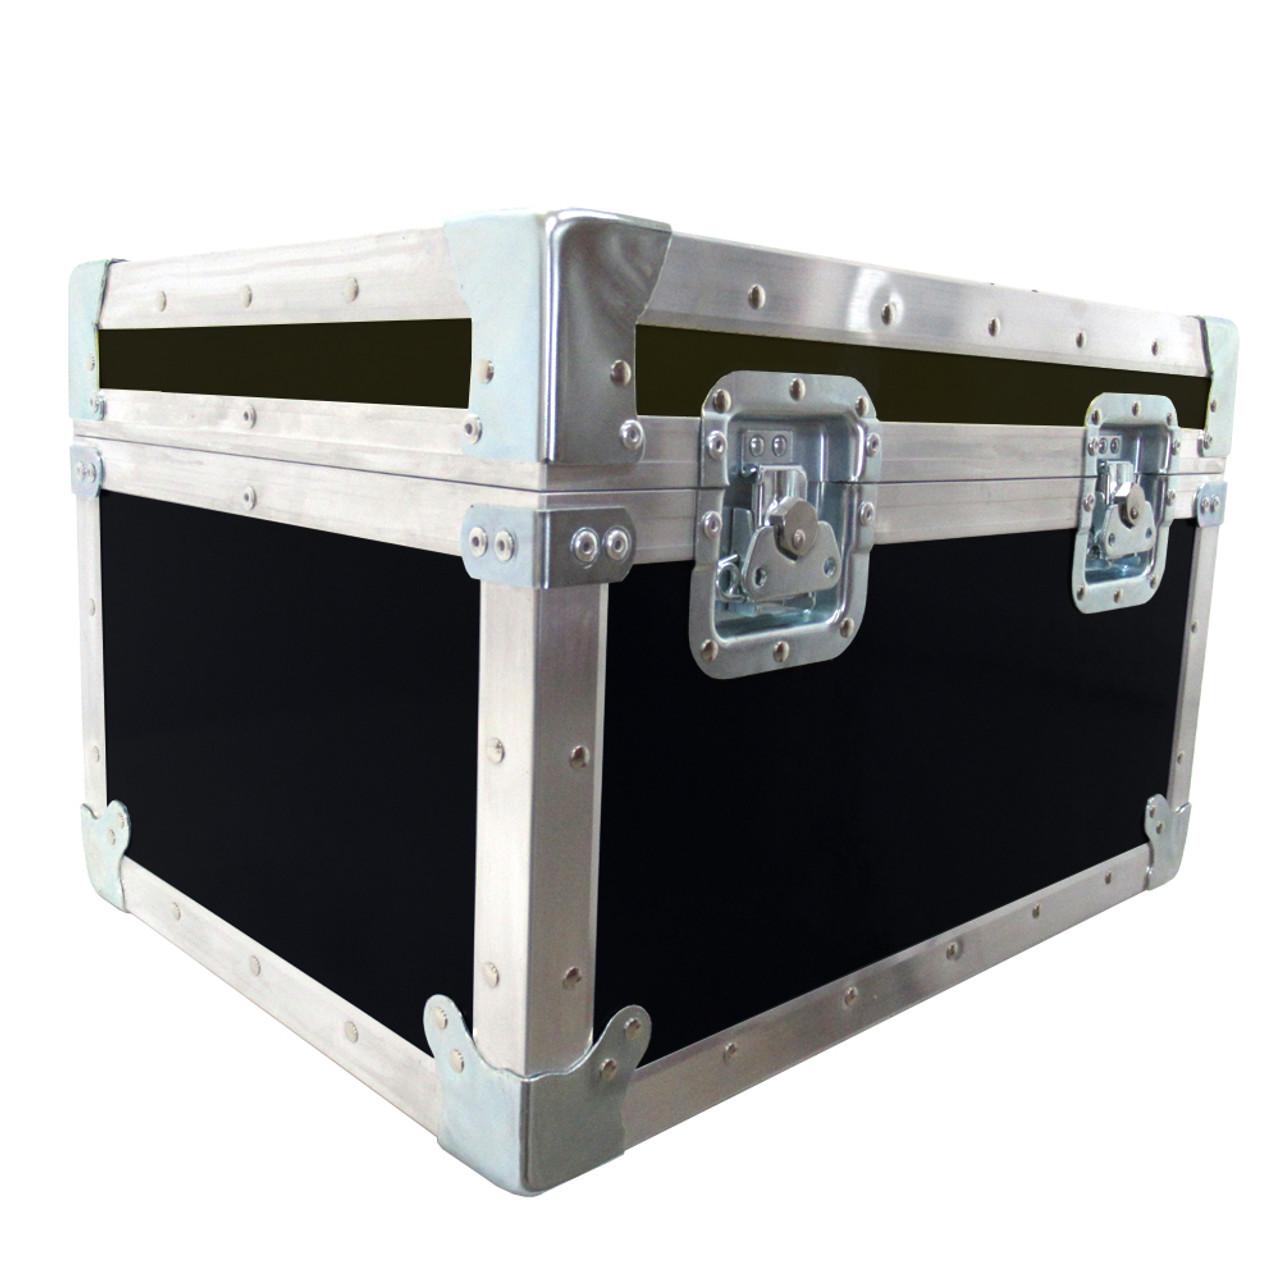 CANON Cine-Servo 25-250mm Shipping Case